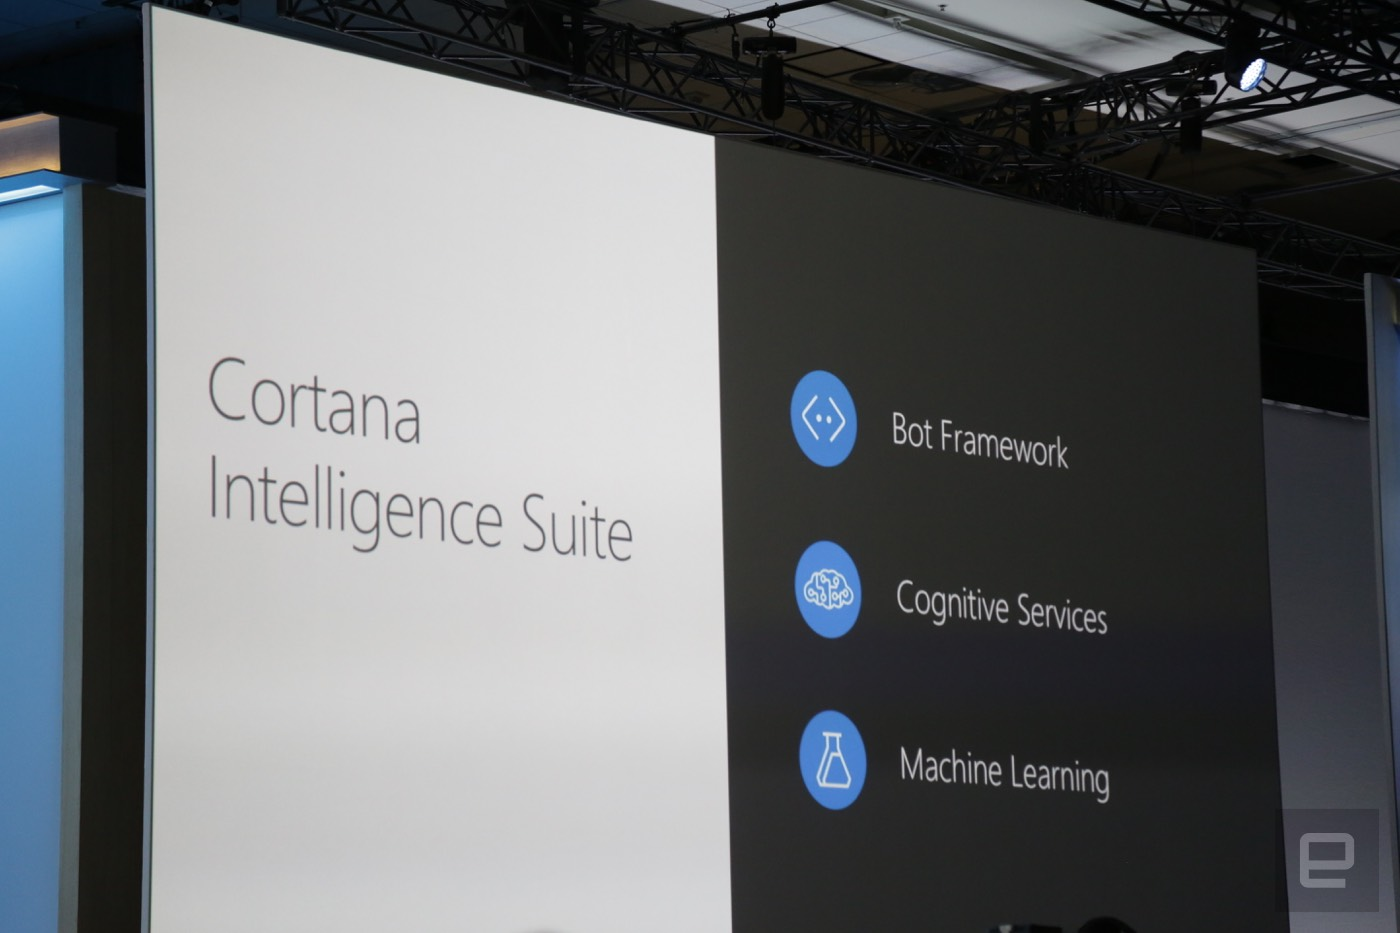 Microsoft's mobile OS isn't Windows -- it's Cortana